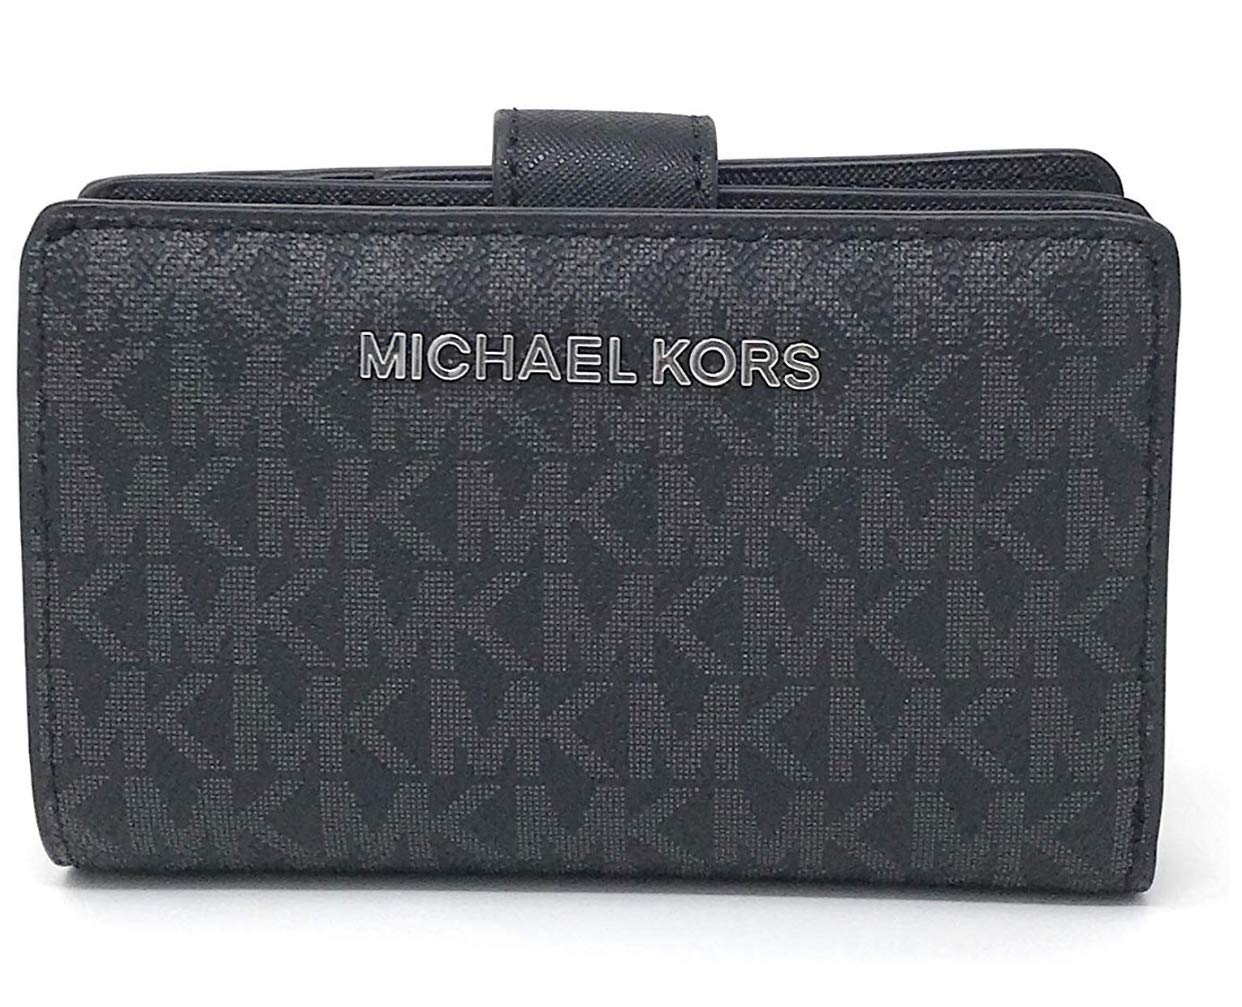 Michael Kors Jet Set Travel Saffiano Leather Bifold Zip Coin Wallet (Black PVC 2019) by Michael Kors (Image #1)